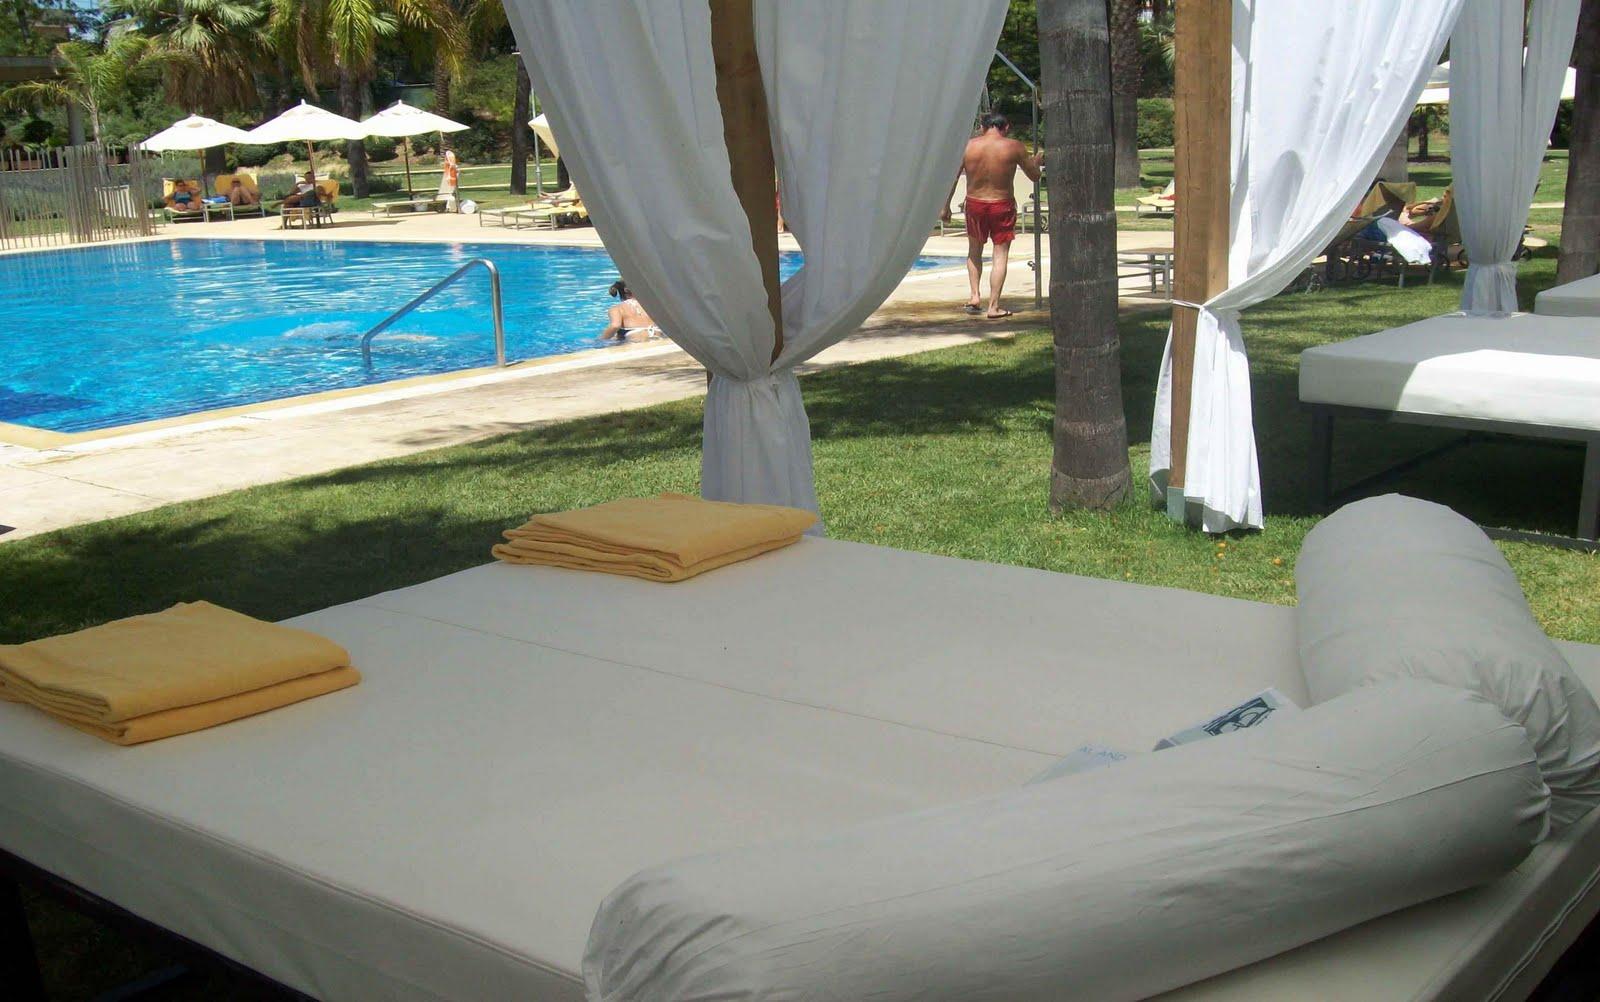 Hoteles de lujo for Hoteles de lujo fotos